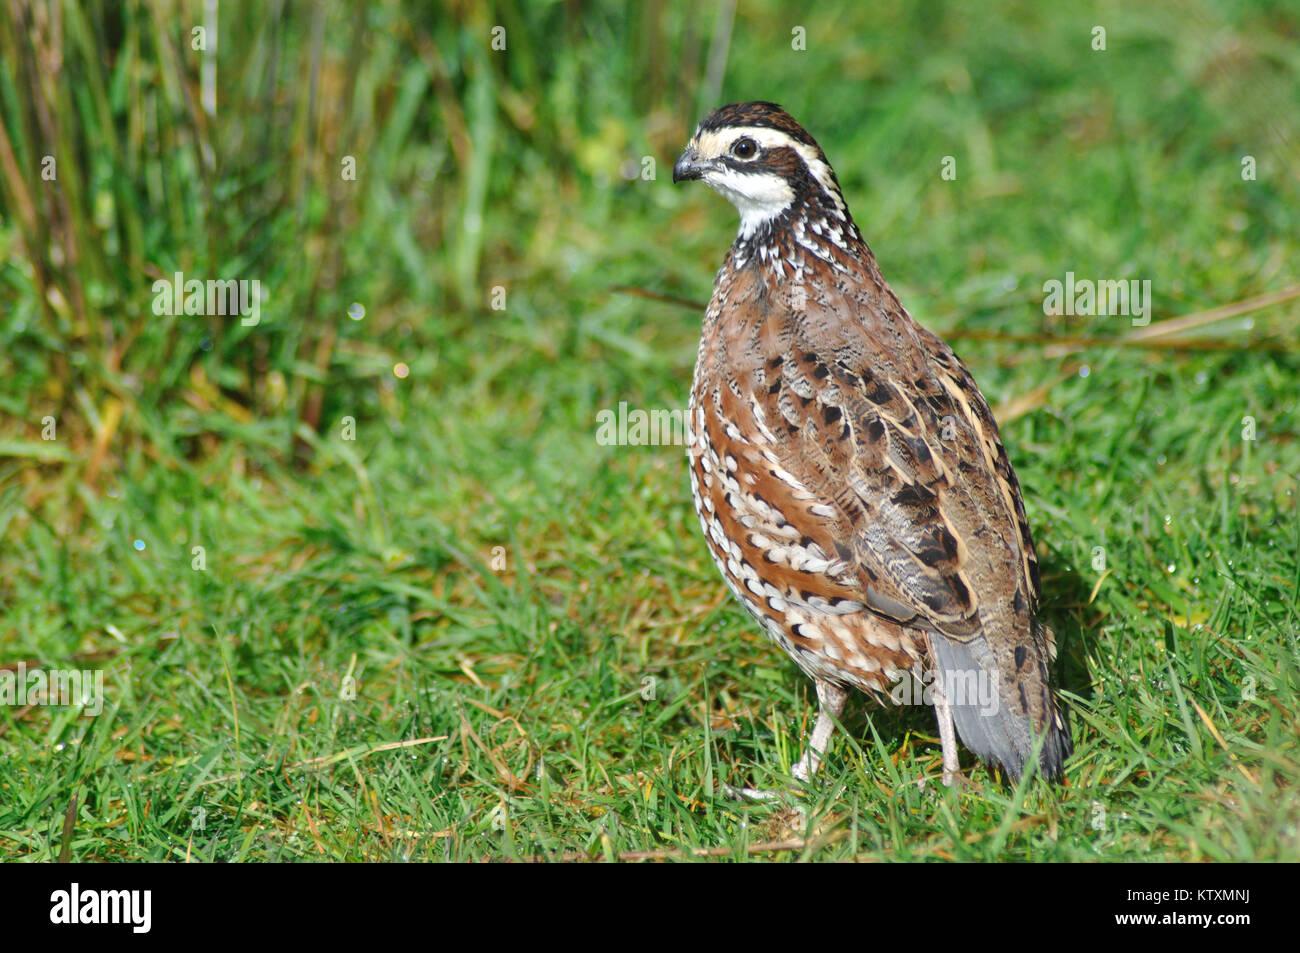 male Northern Bobwhite, Virginia Quail or Bobwhite Quail, Colinus virginianus, a ground-dwelling bird native to - Stock Image